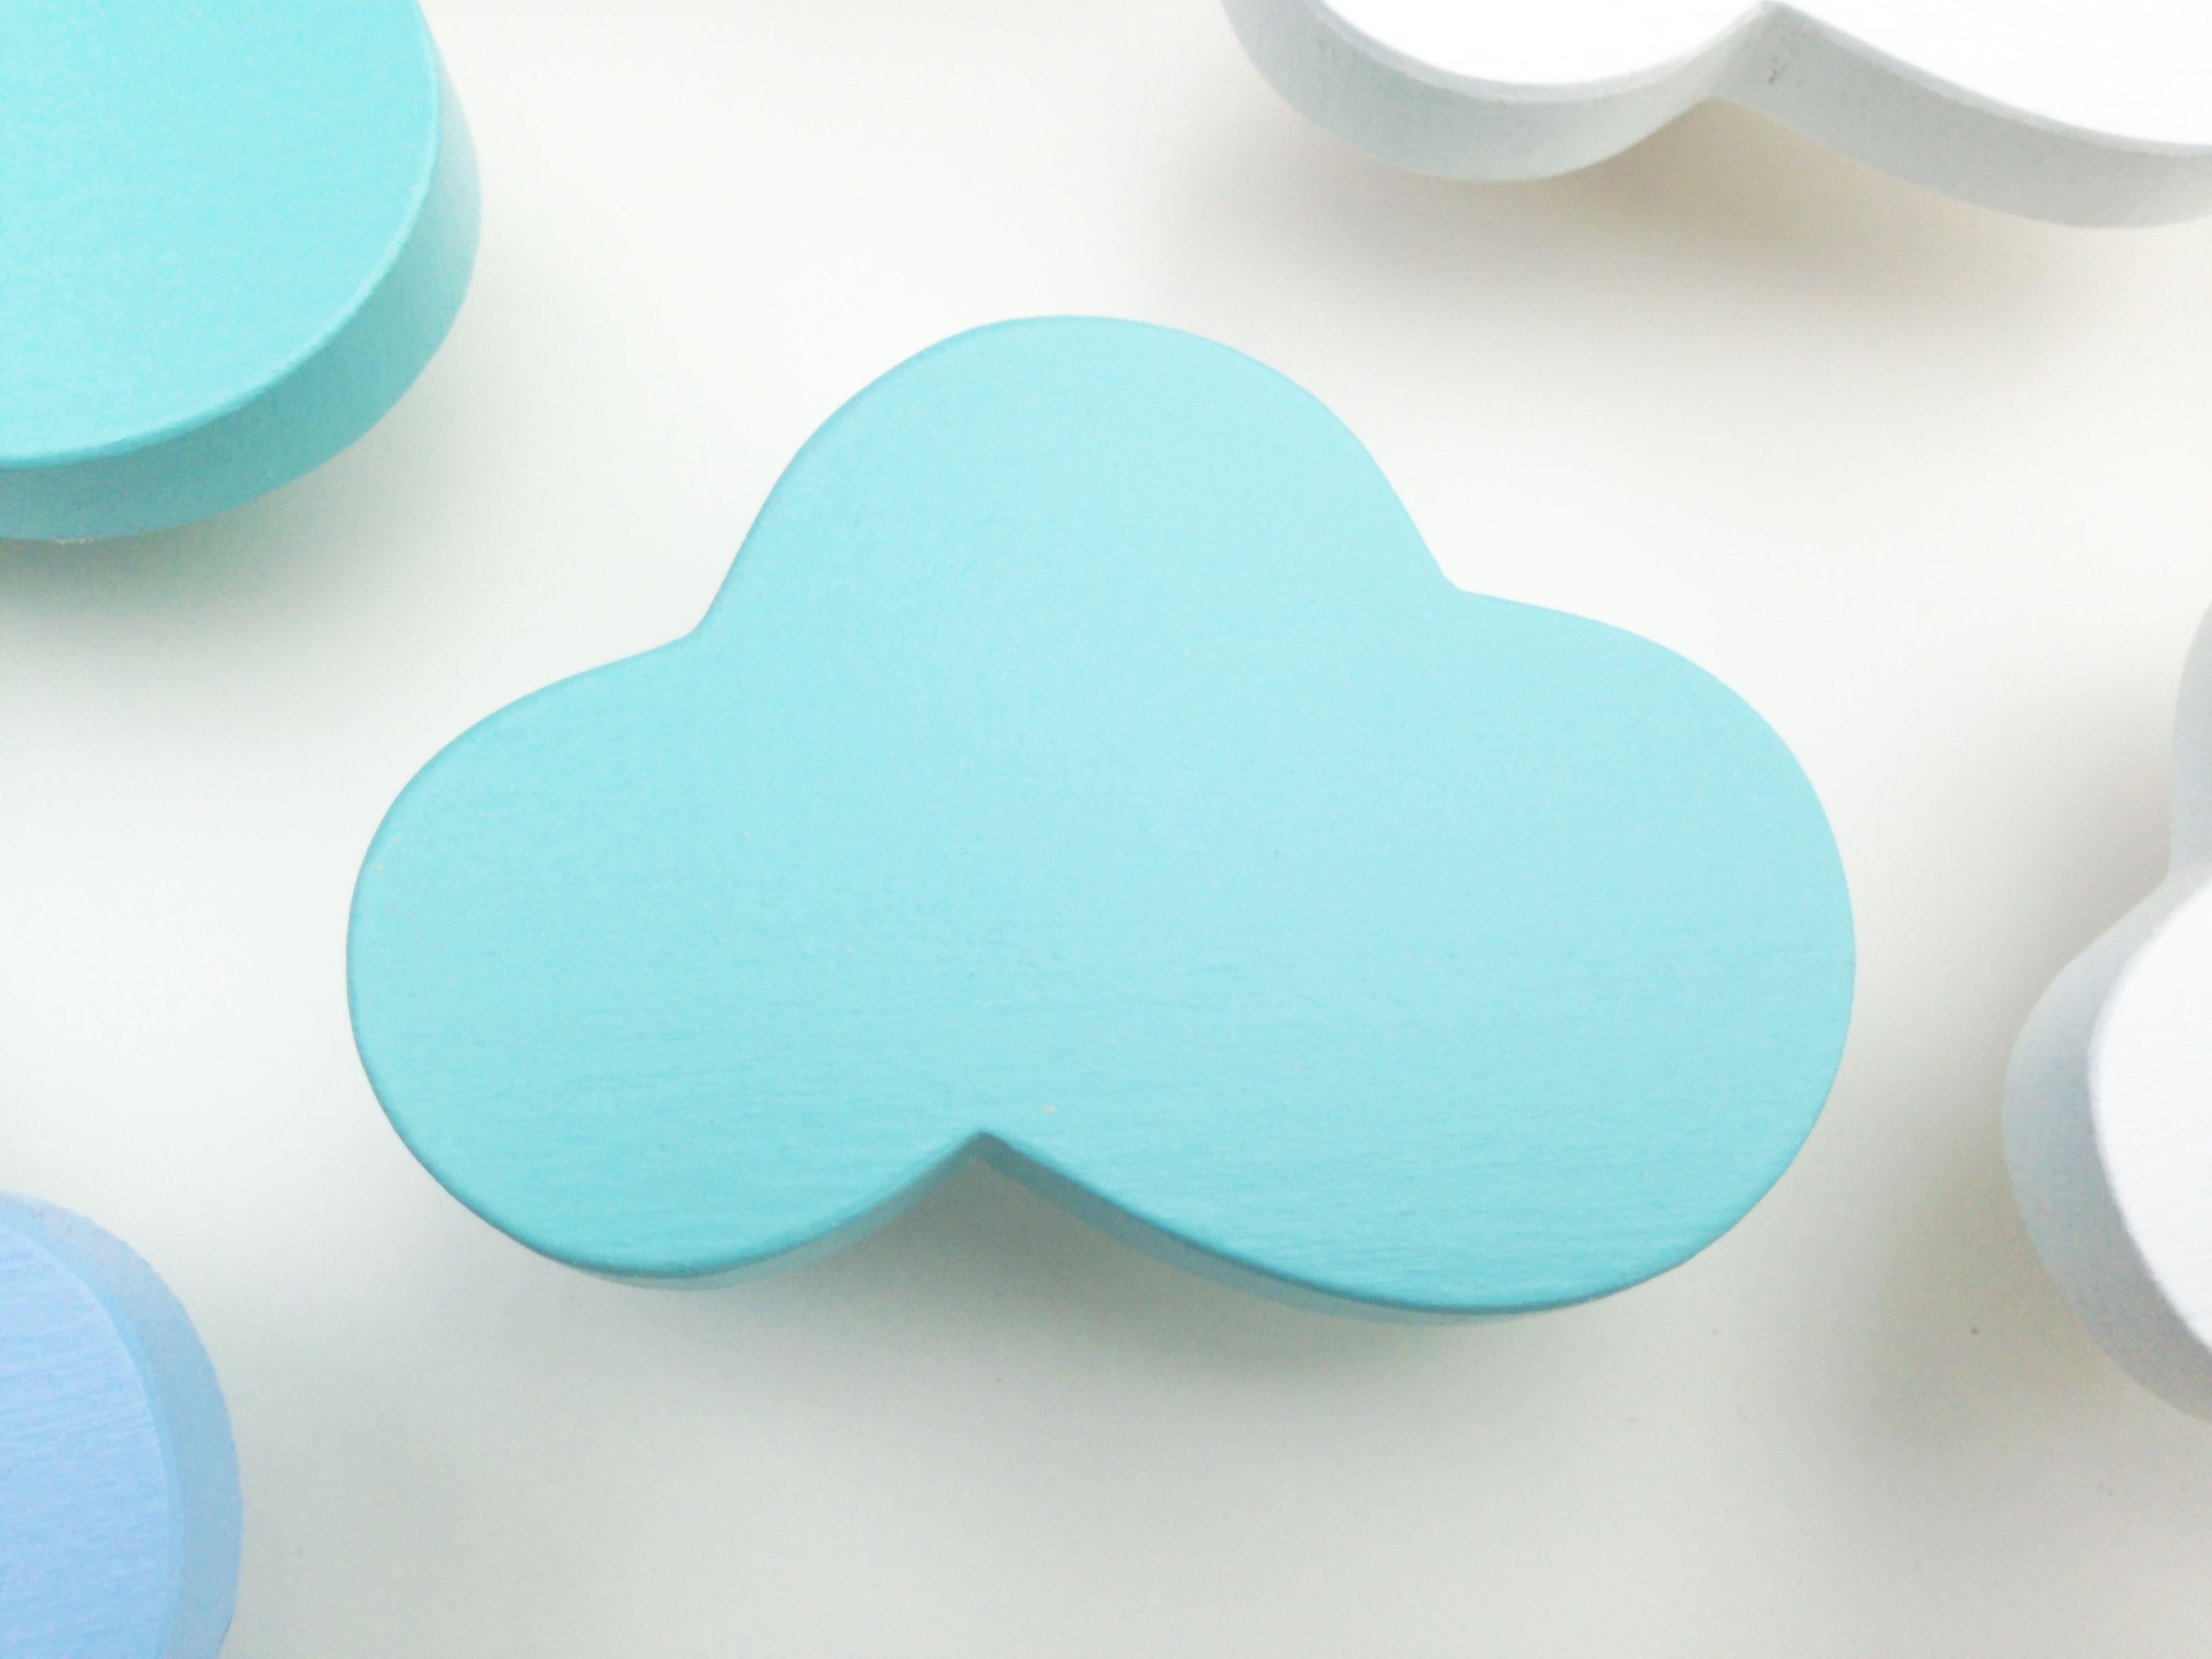 stern hellblau - möbelgriff / möbelknopf für kinderzimmer | elyas